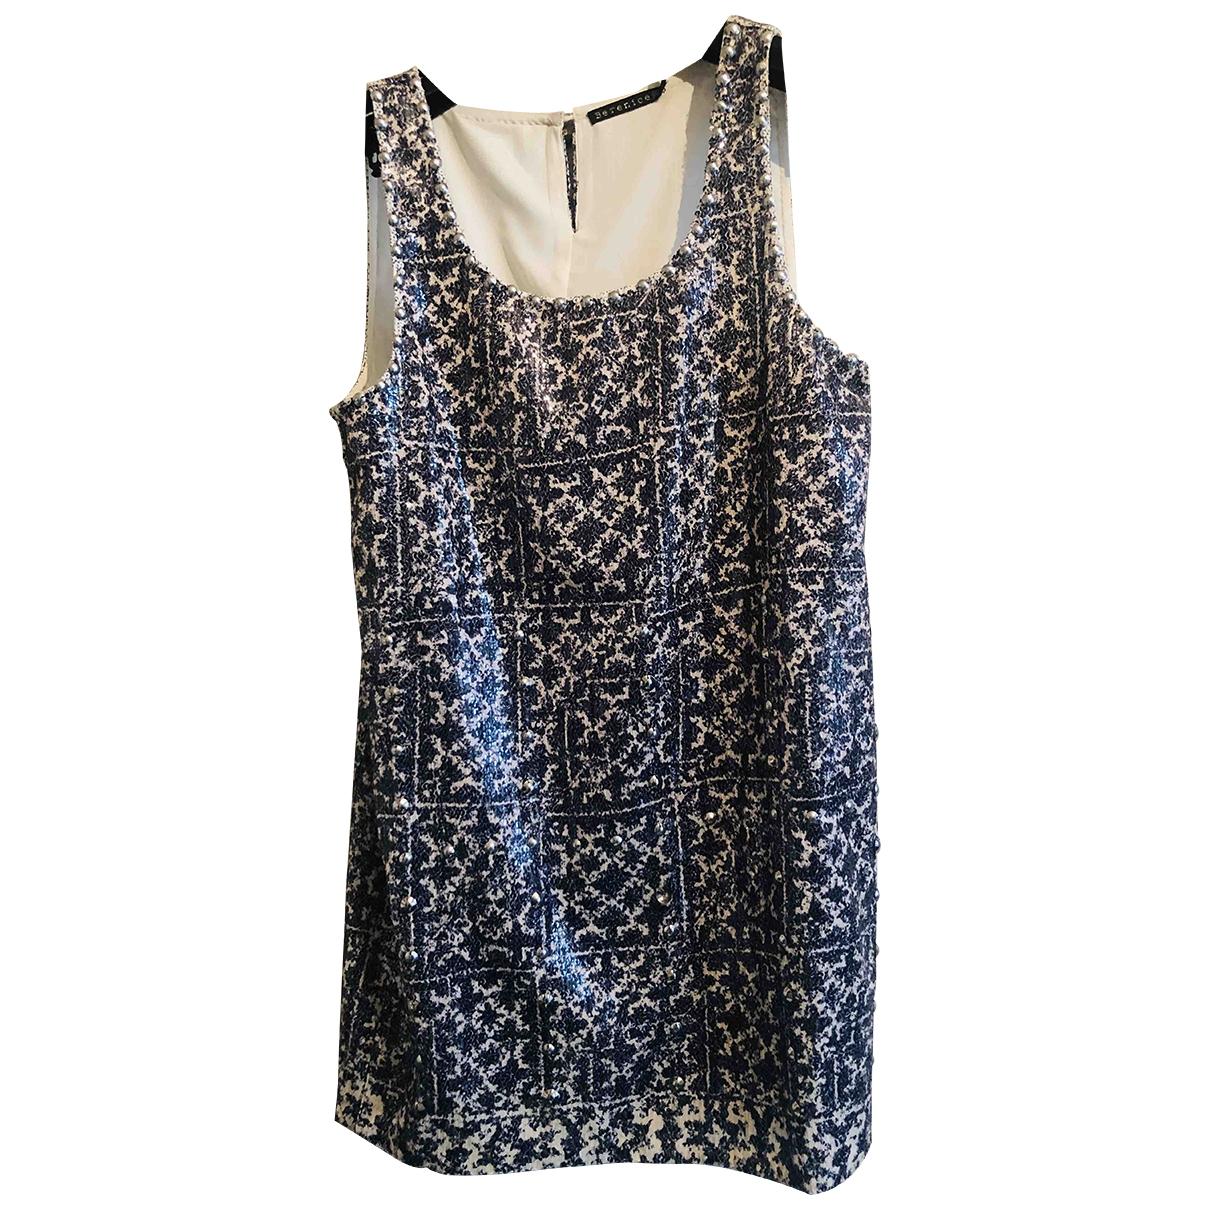 Berenice \N Kleid in  Schwarz Polyester